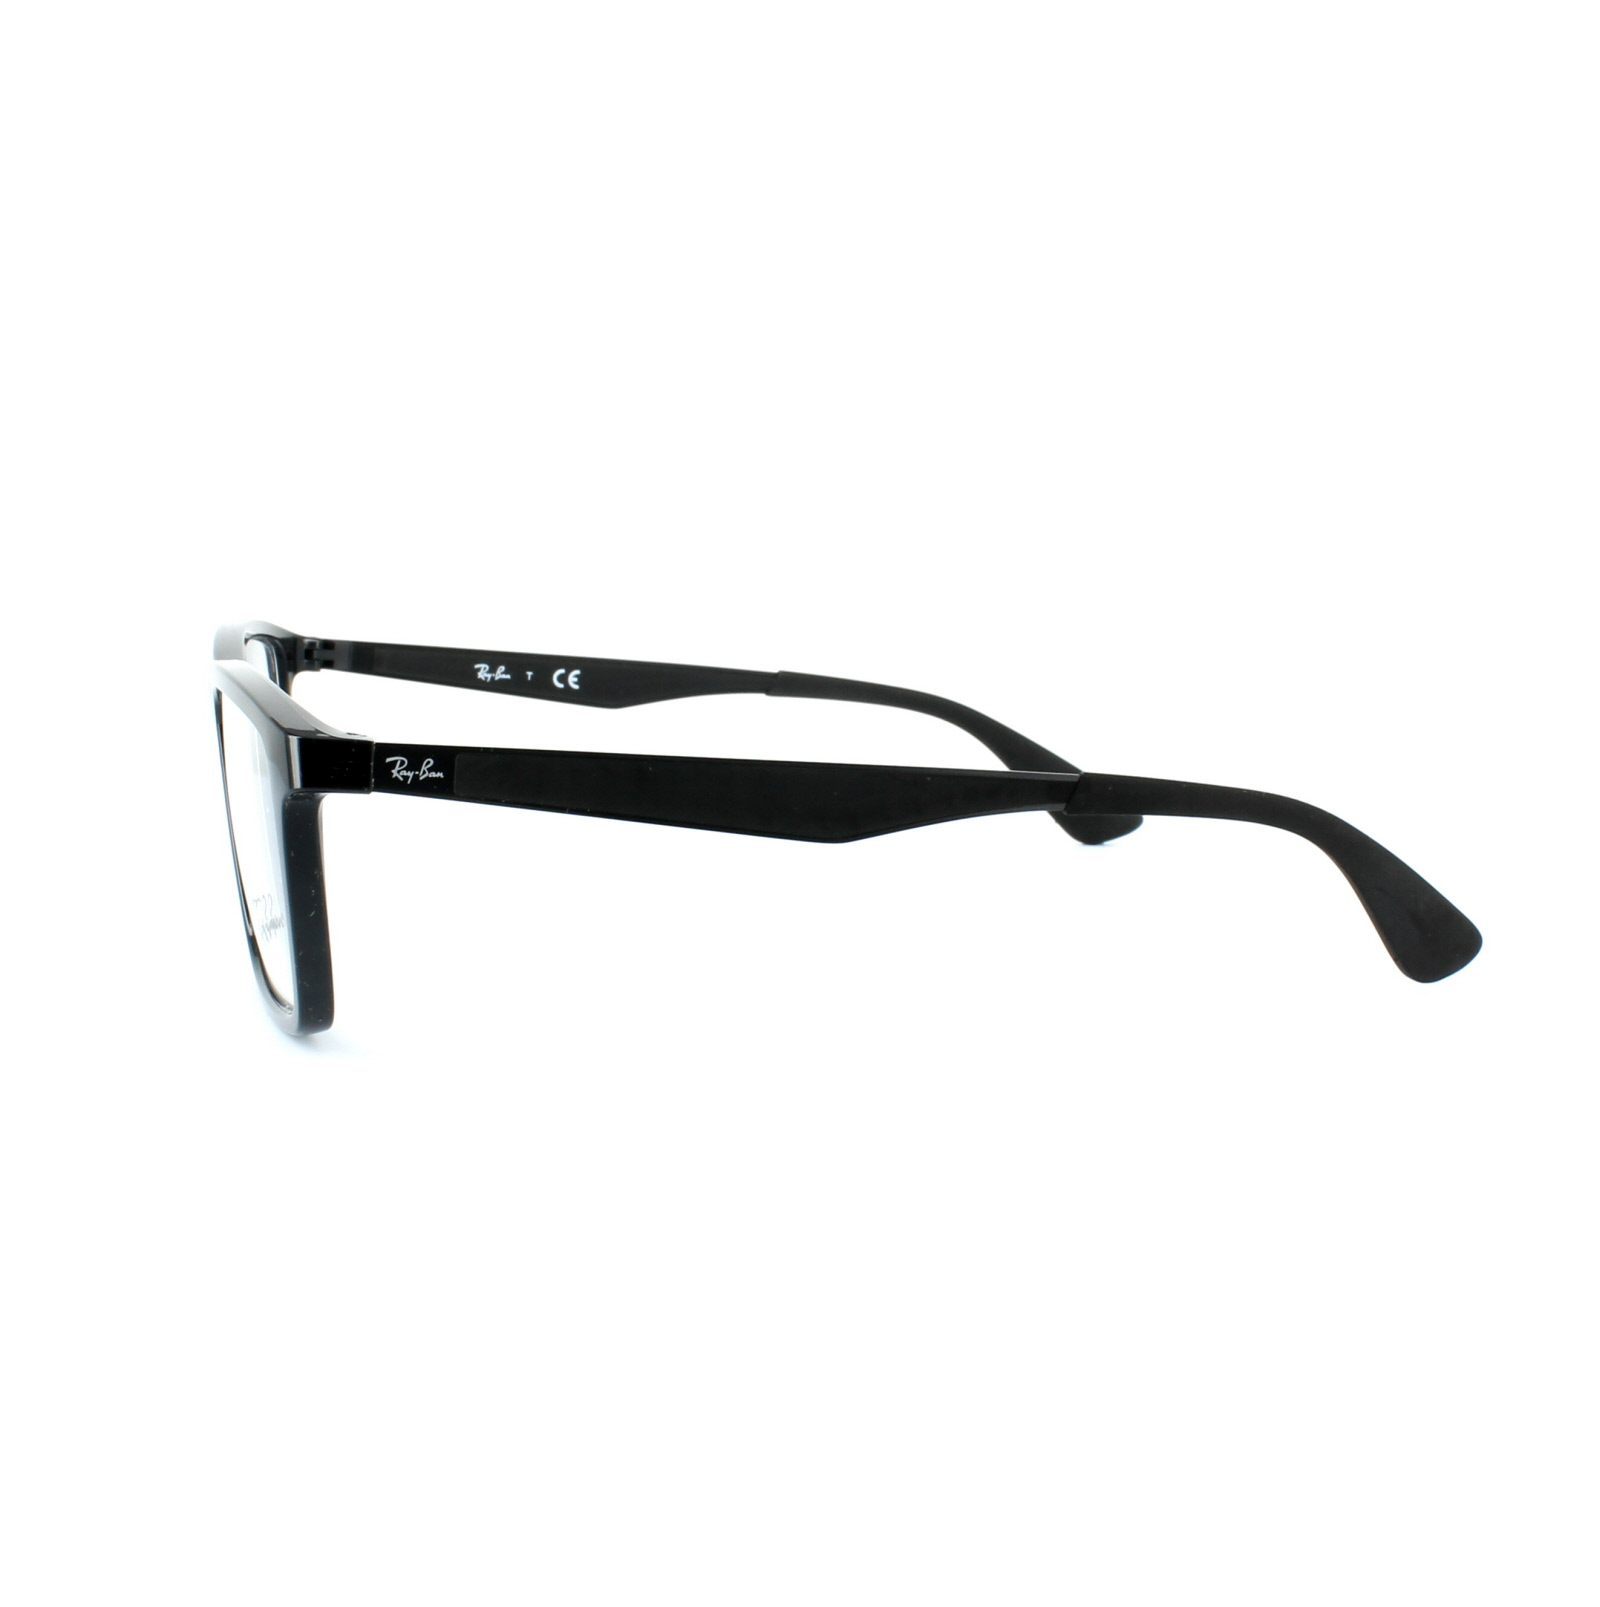 f509725458 Cheap Ray-Ban 7056 Glasses Frames - Discounted Sunglasses